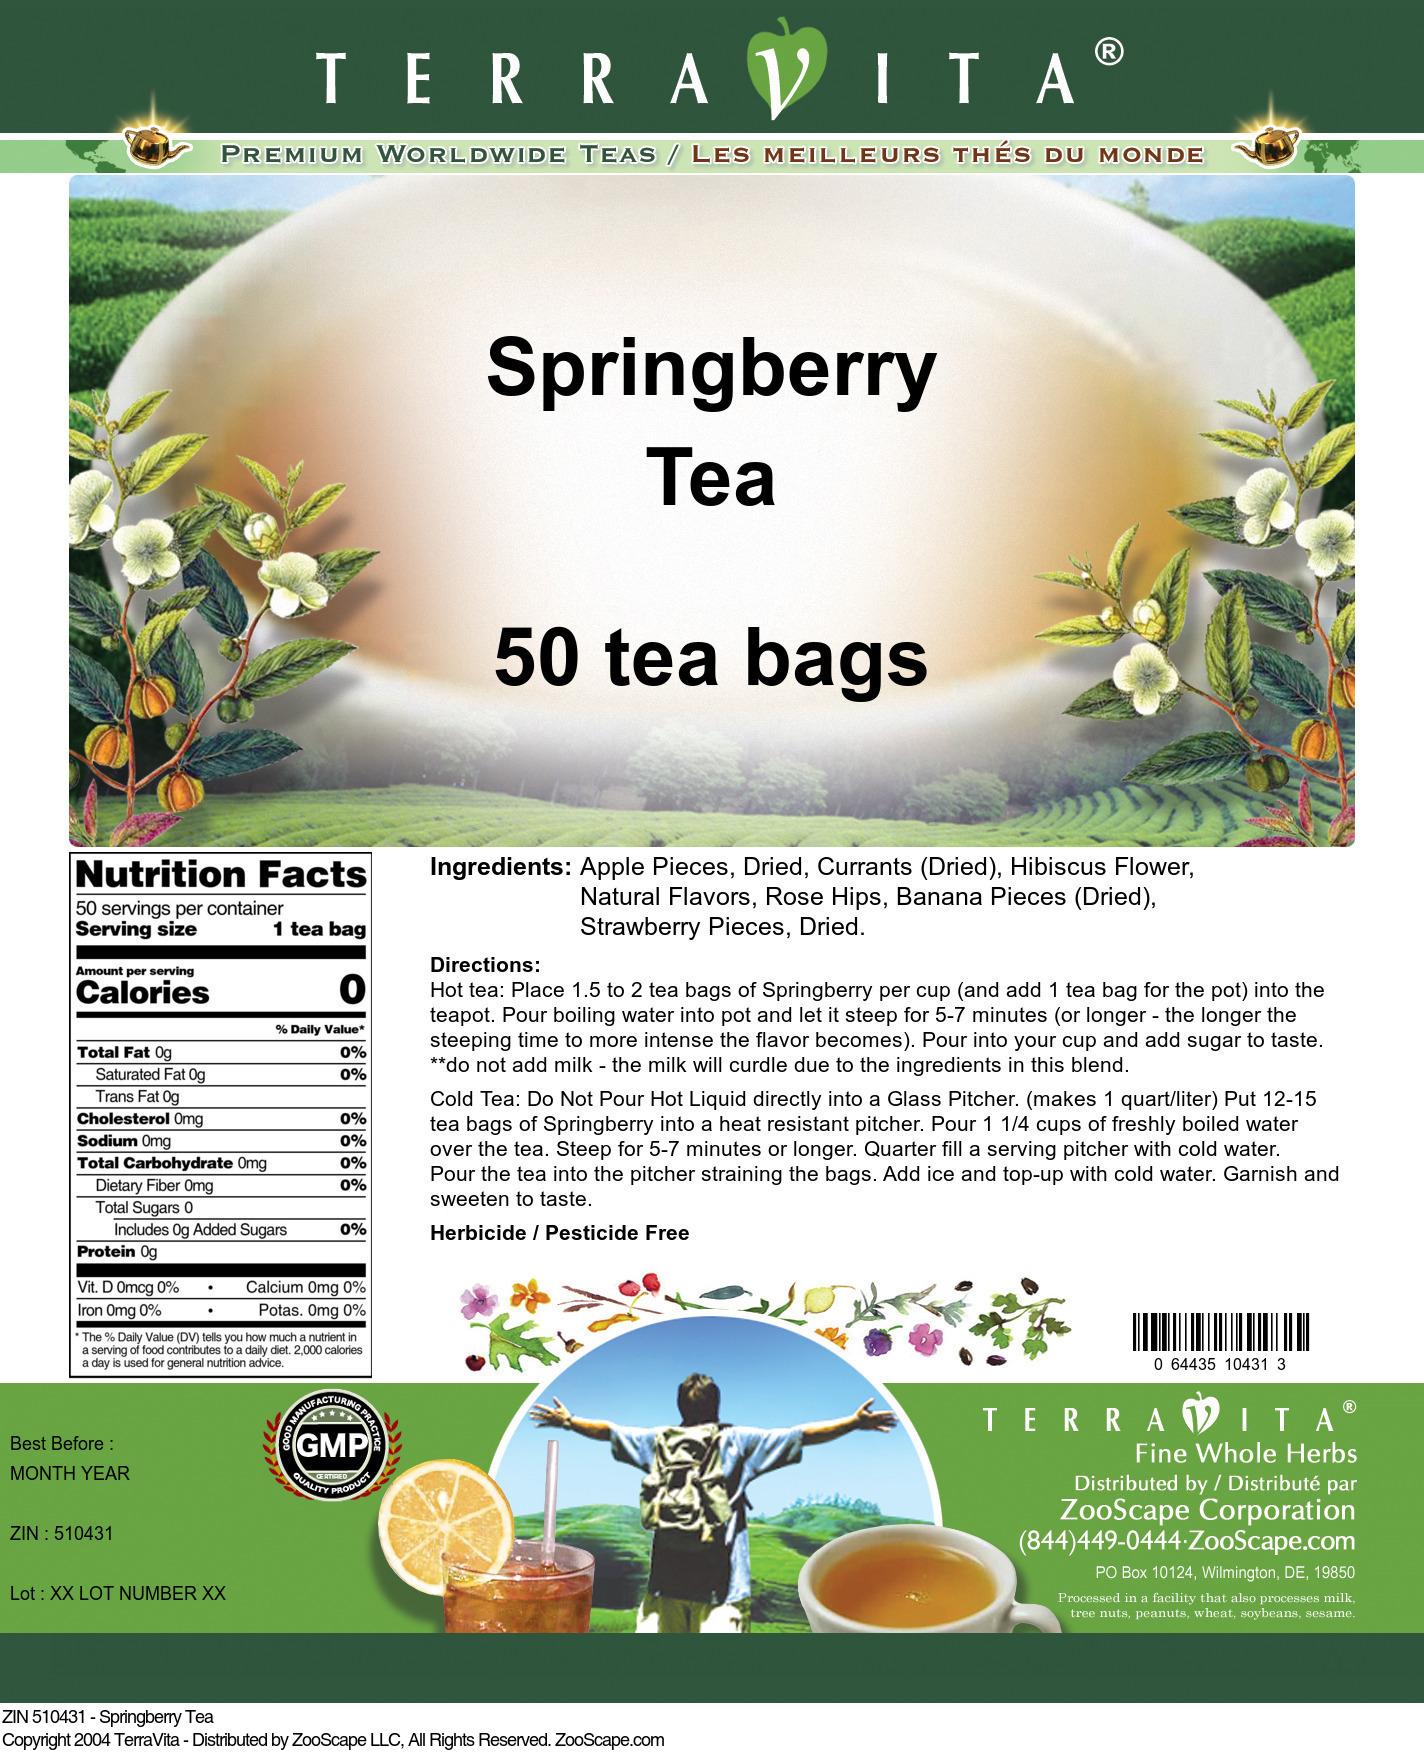 Springberry